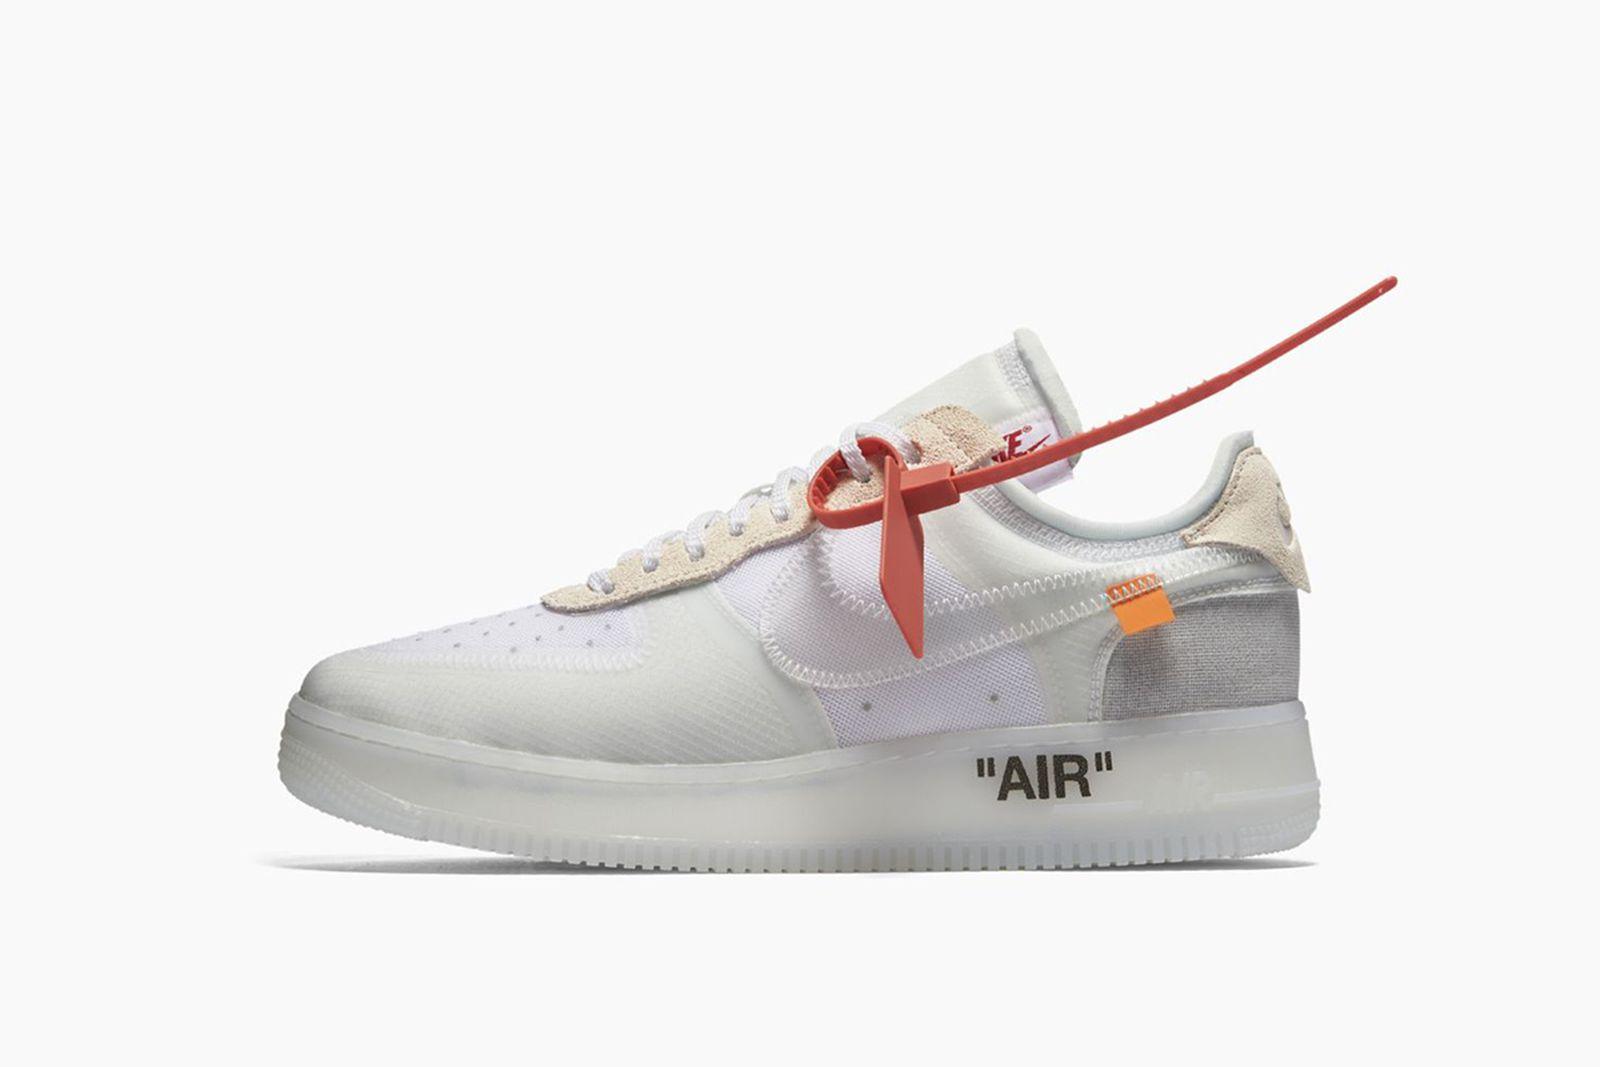 air force 1 GOAT Nike The Ten OFF-WHITE c/o Virgil Abloh